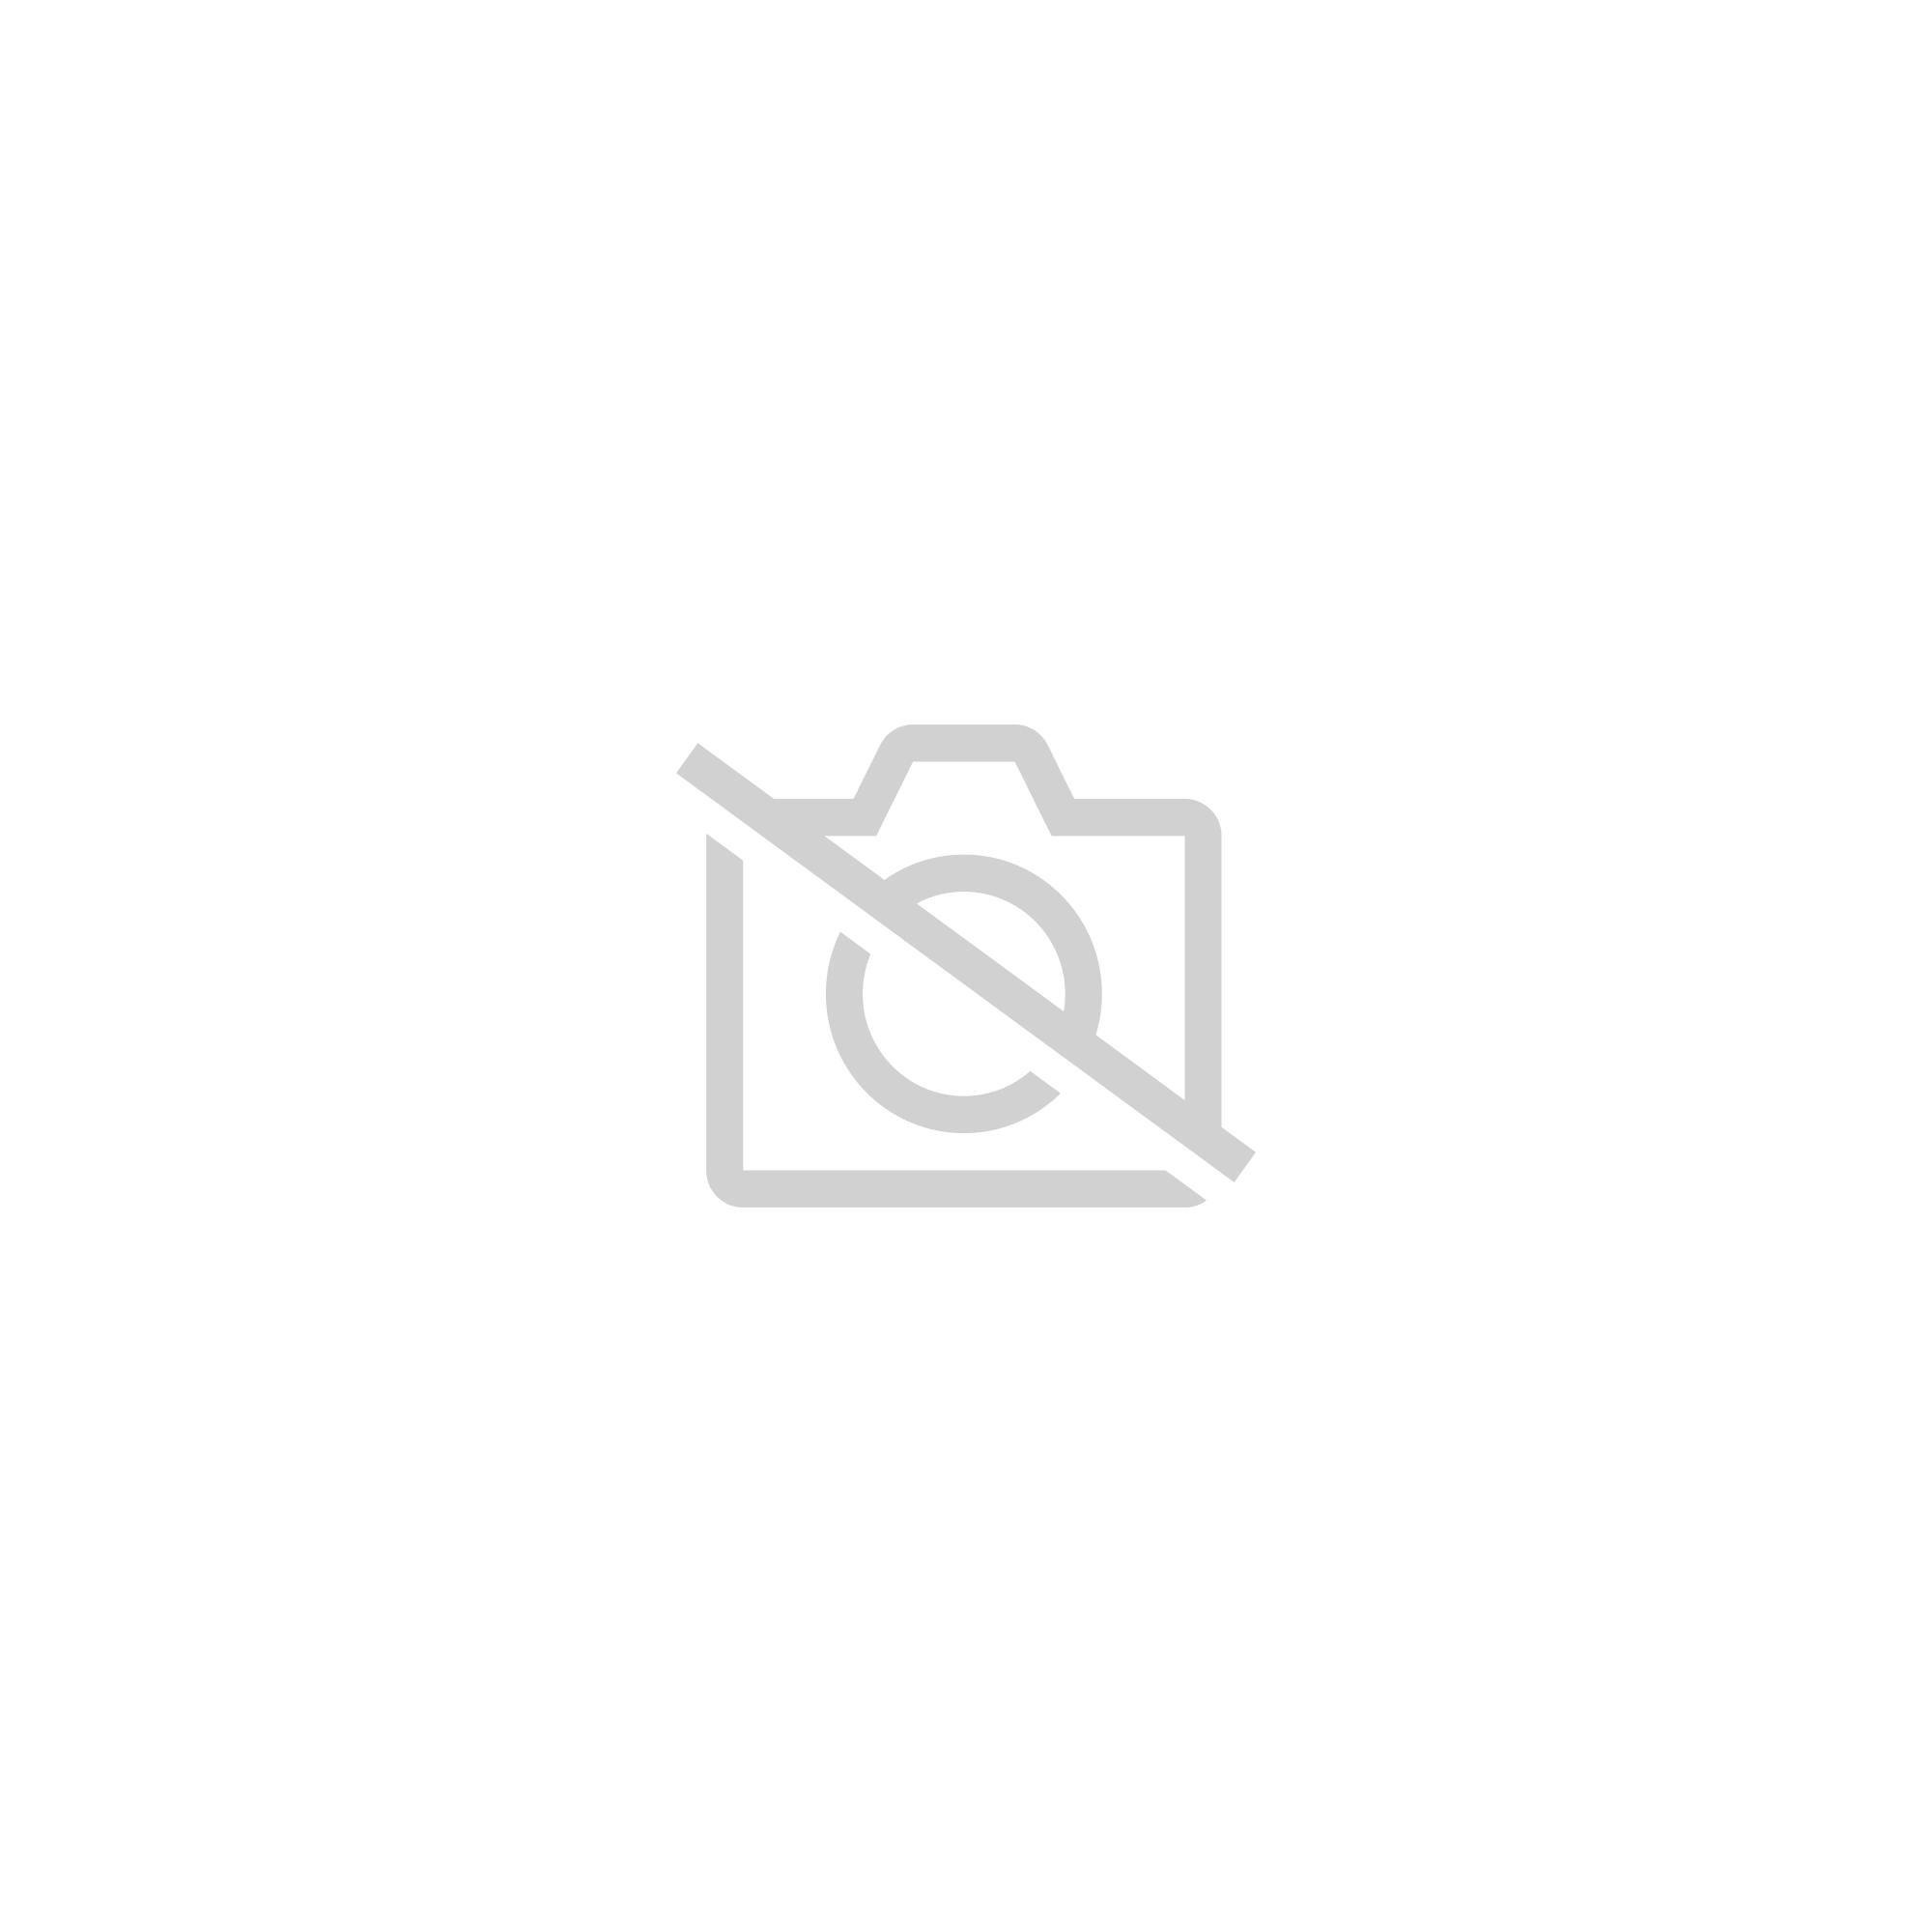 application pour tablette samsung galaxy tab 2